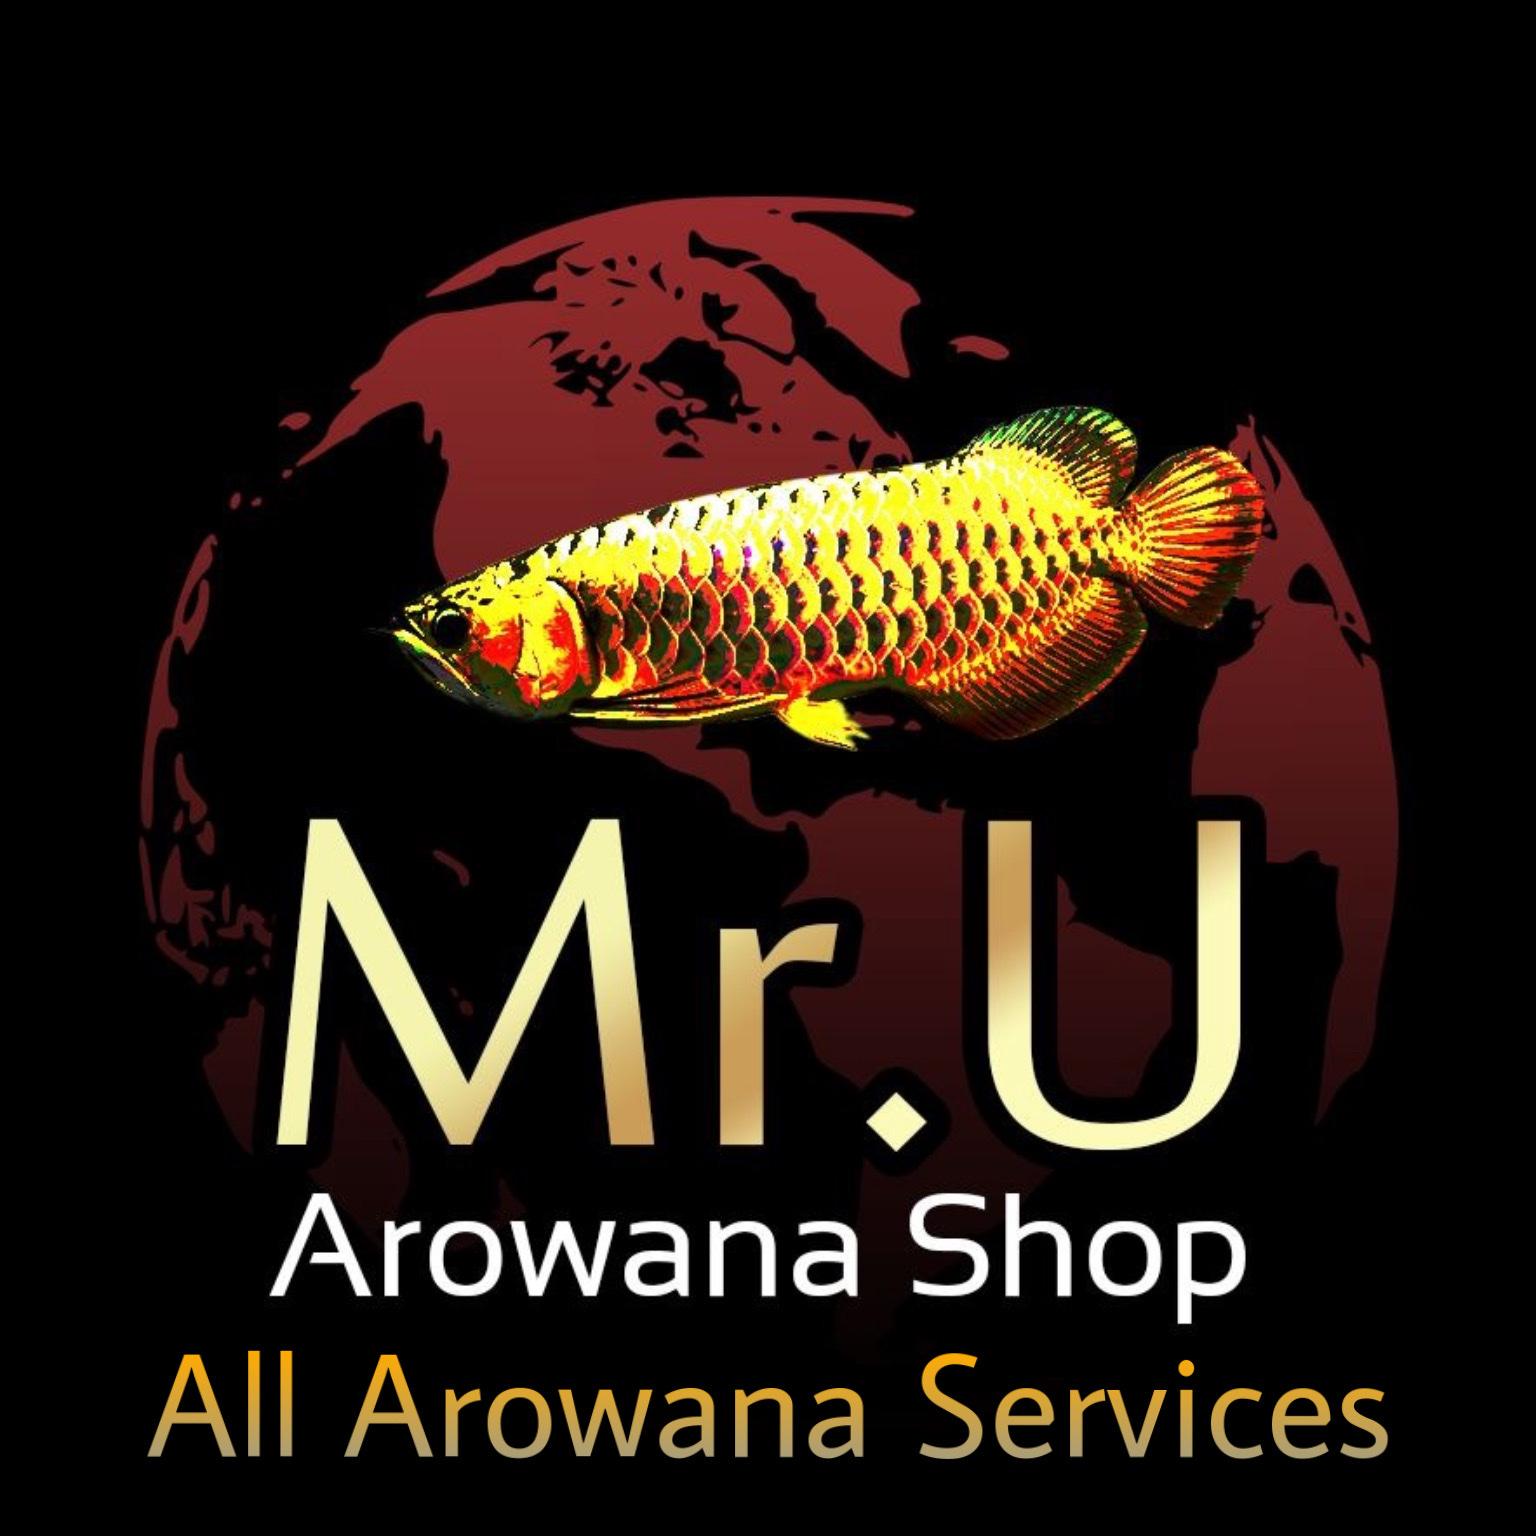 Mr. U Arowana Shop & Services